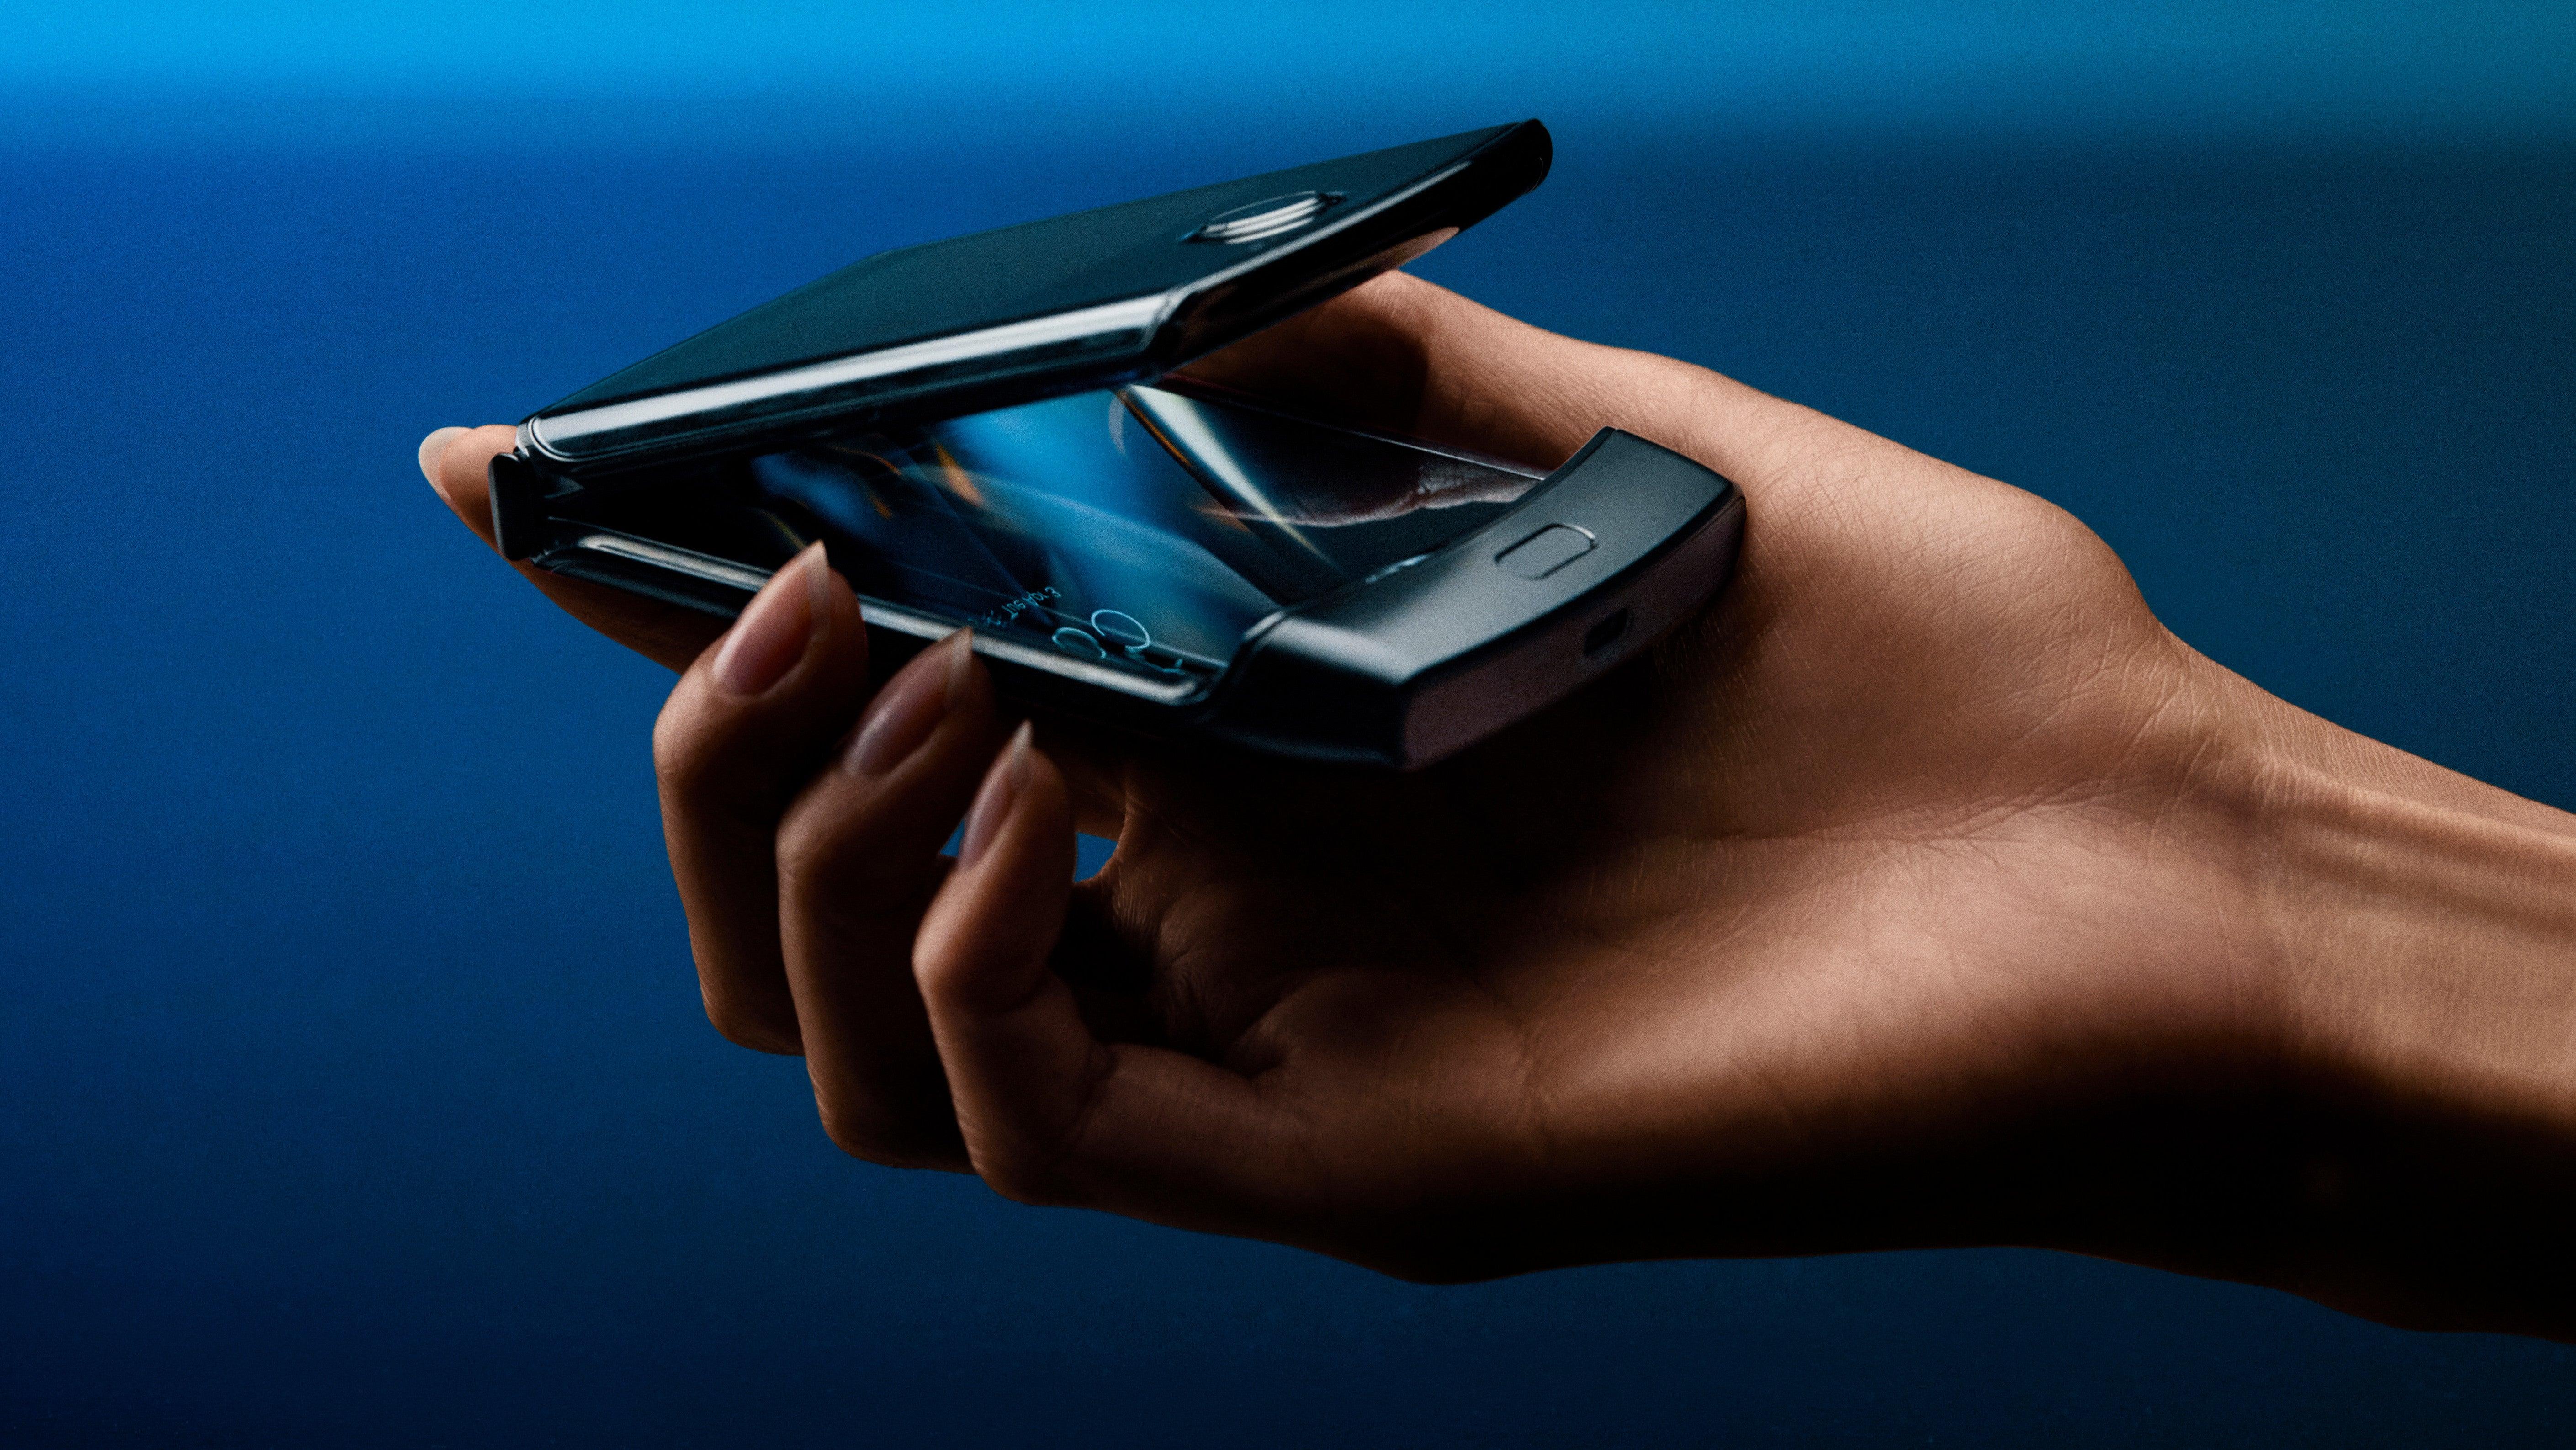 Motorola Razr: The Flip Phone Just Evolved